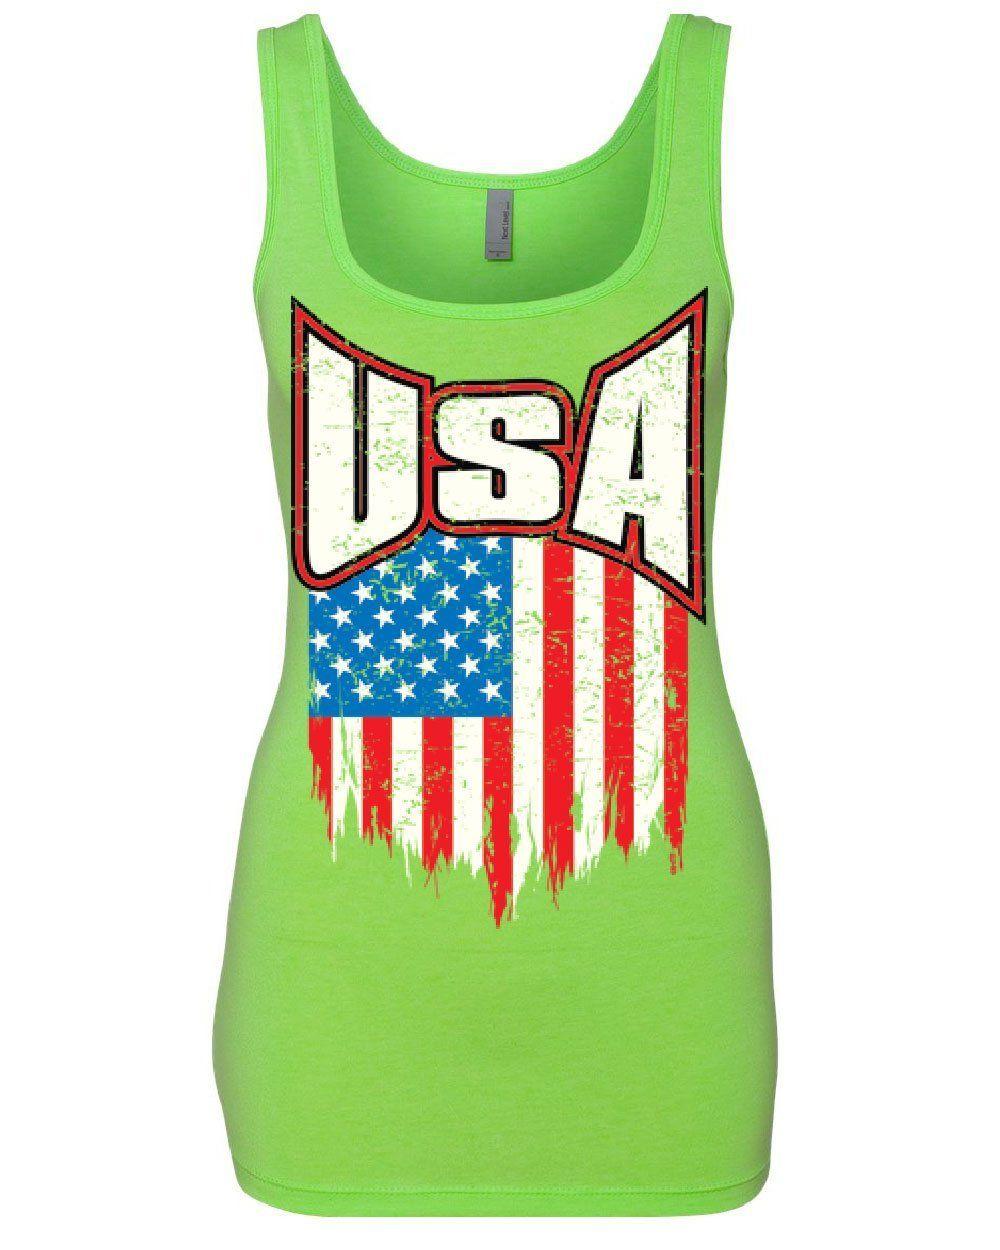 Tee Hunt USA Distressed Flag Tank Top 4th of July Stars /& Stripes Patriot Sleeveless